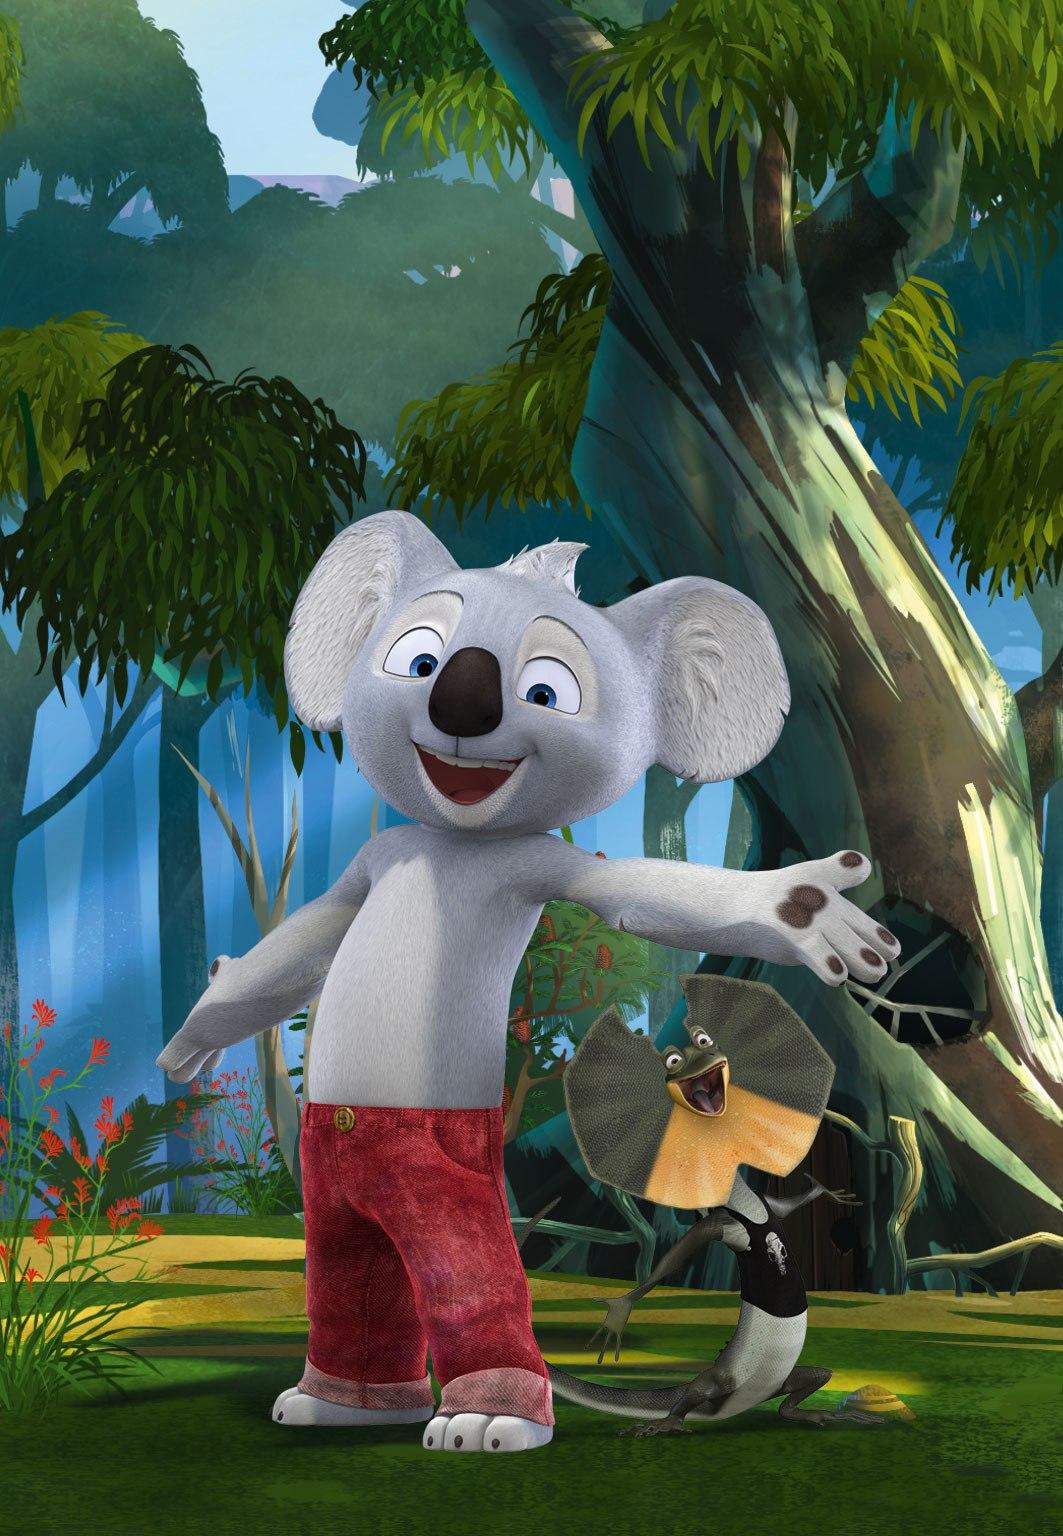 Studio 100 Media's 'The Wild Adventures of Blinky Bill' to